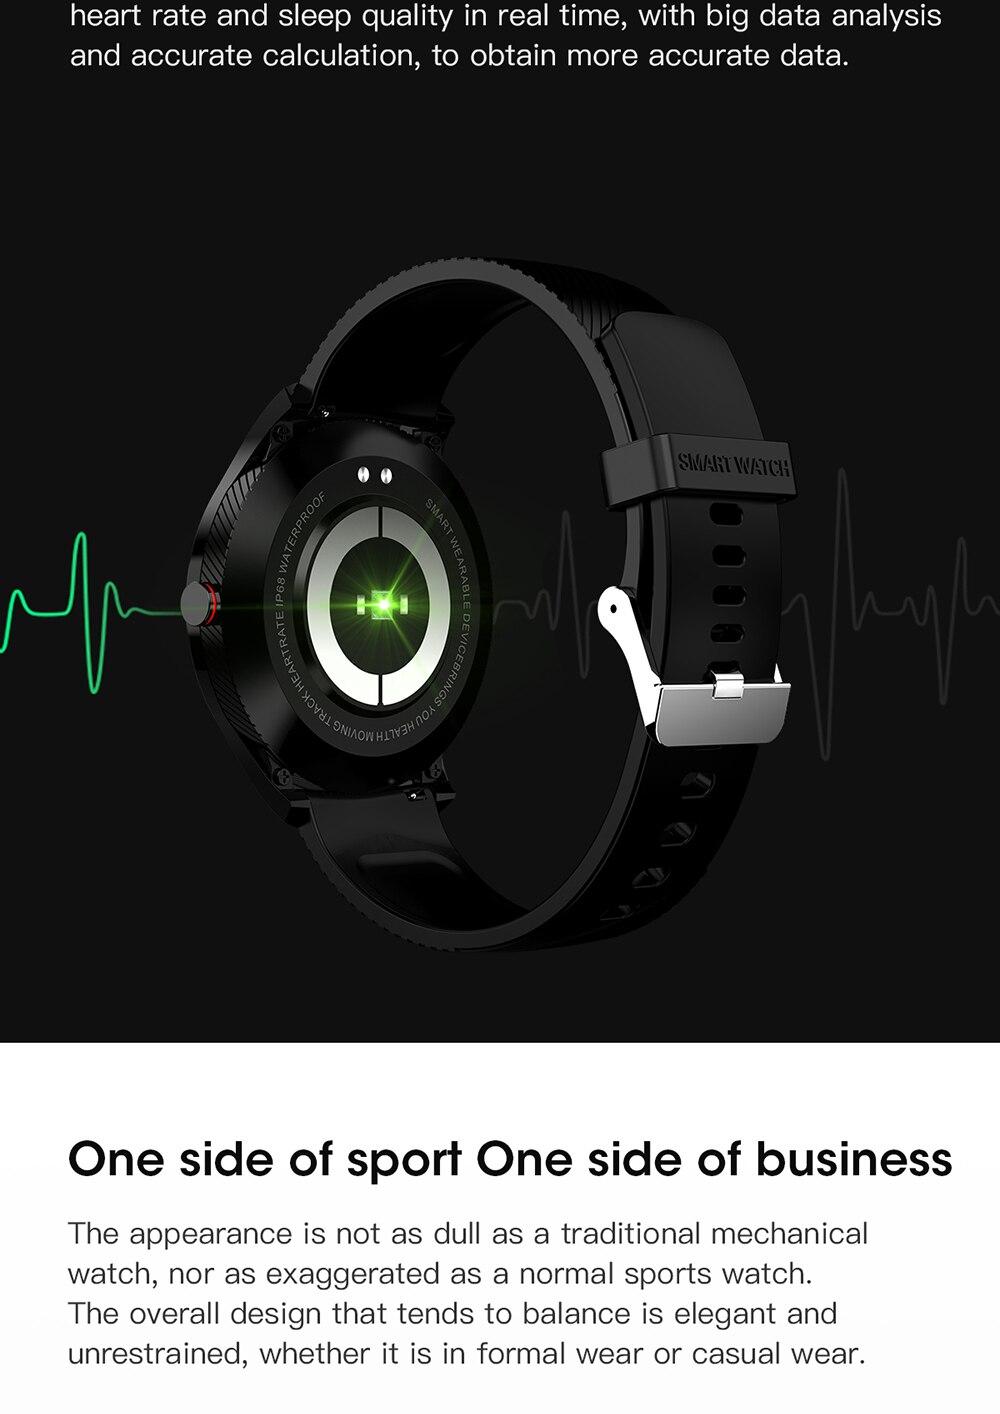 Hf26d7feb644d4f6e87aabfe5aec39aafN 696 L9 Full touch Smart Watch Men ECG+PPG Heart Rate Blood Pressure oxygen Monitor IP68 Waterproof Bluetooth Smart Bracelet